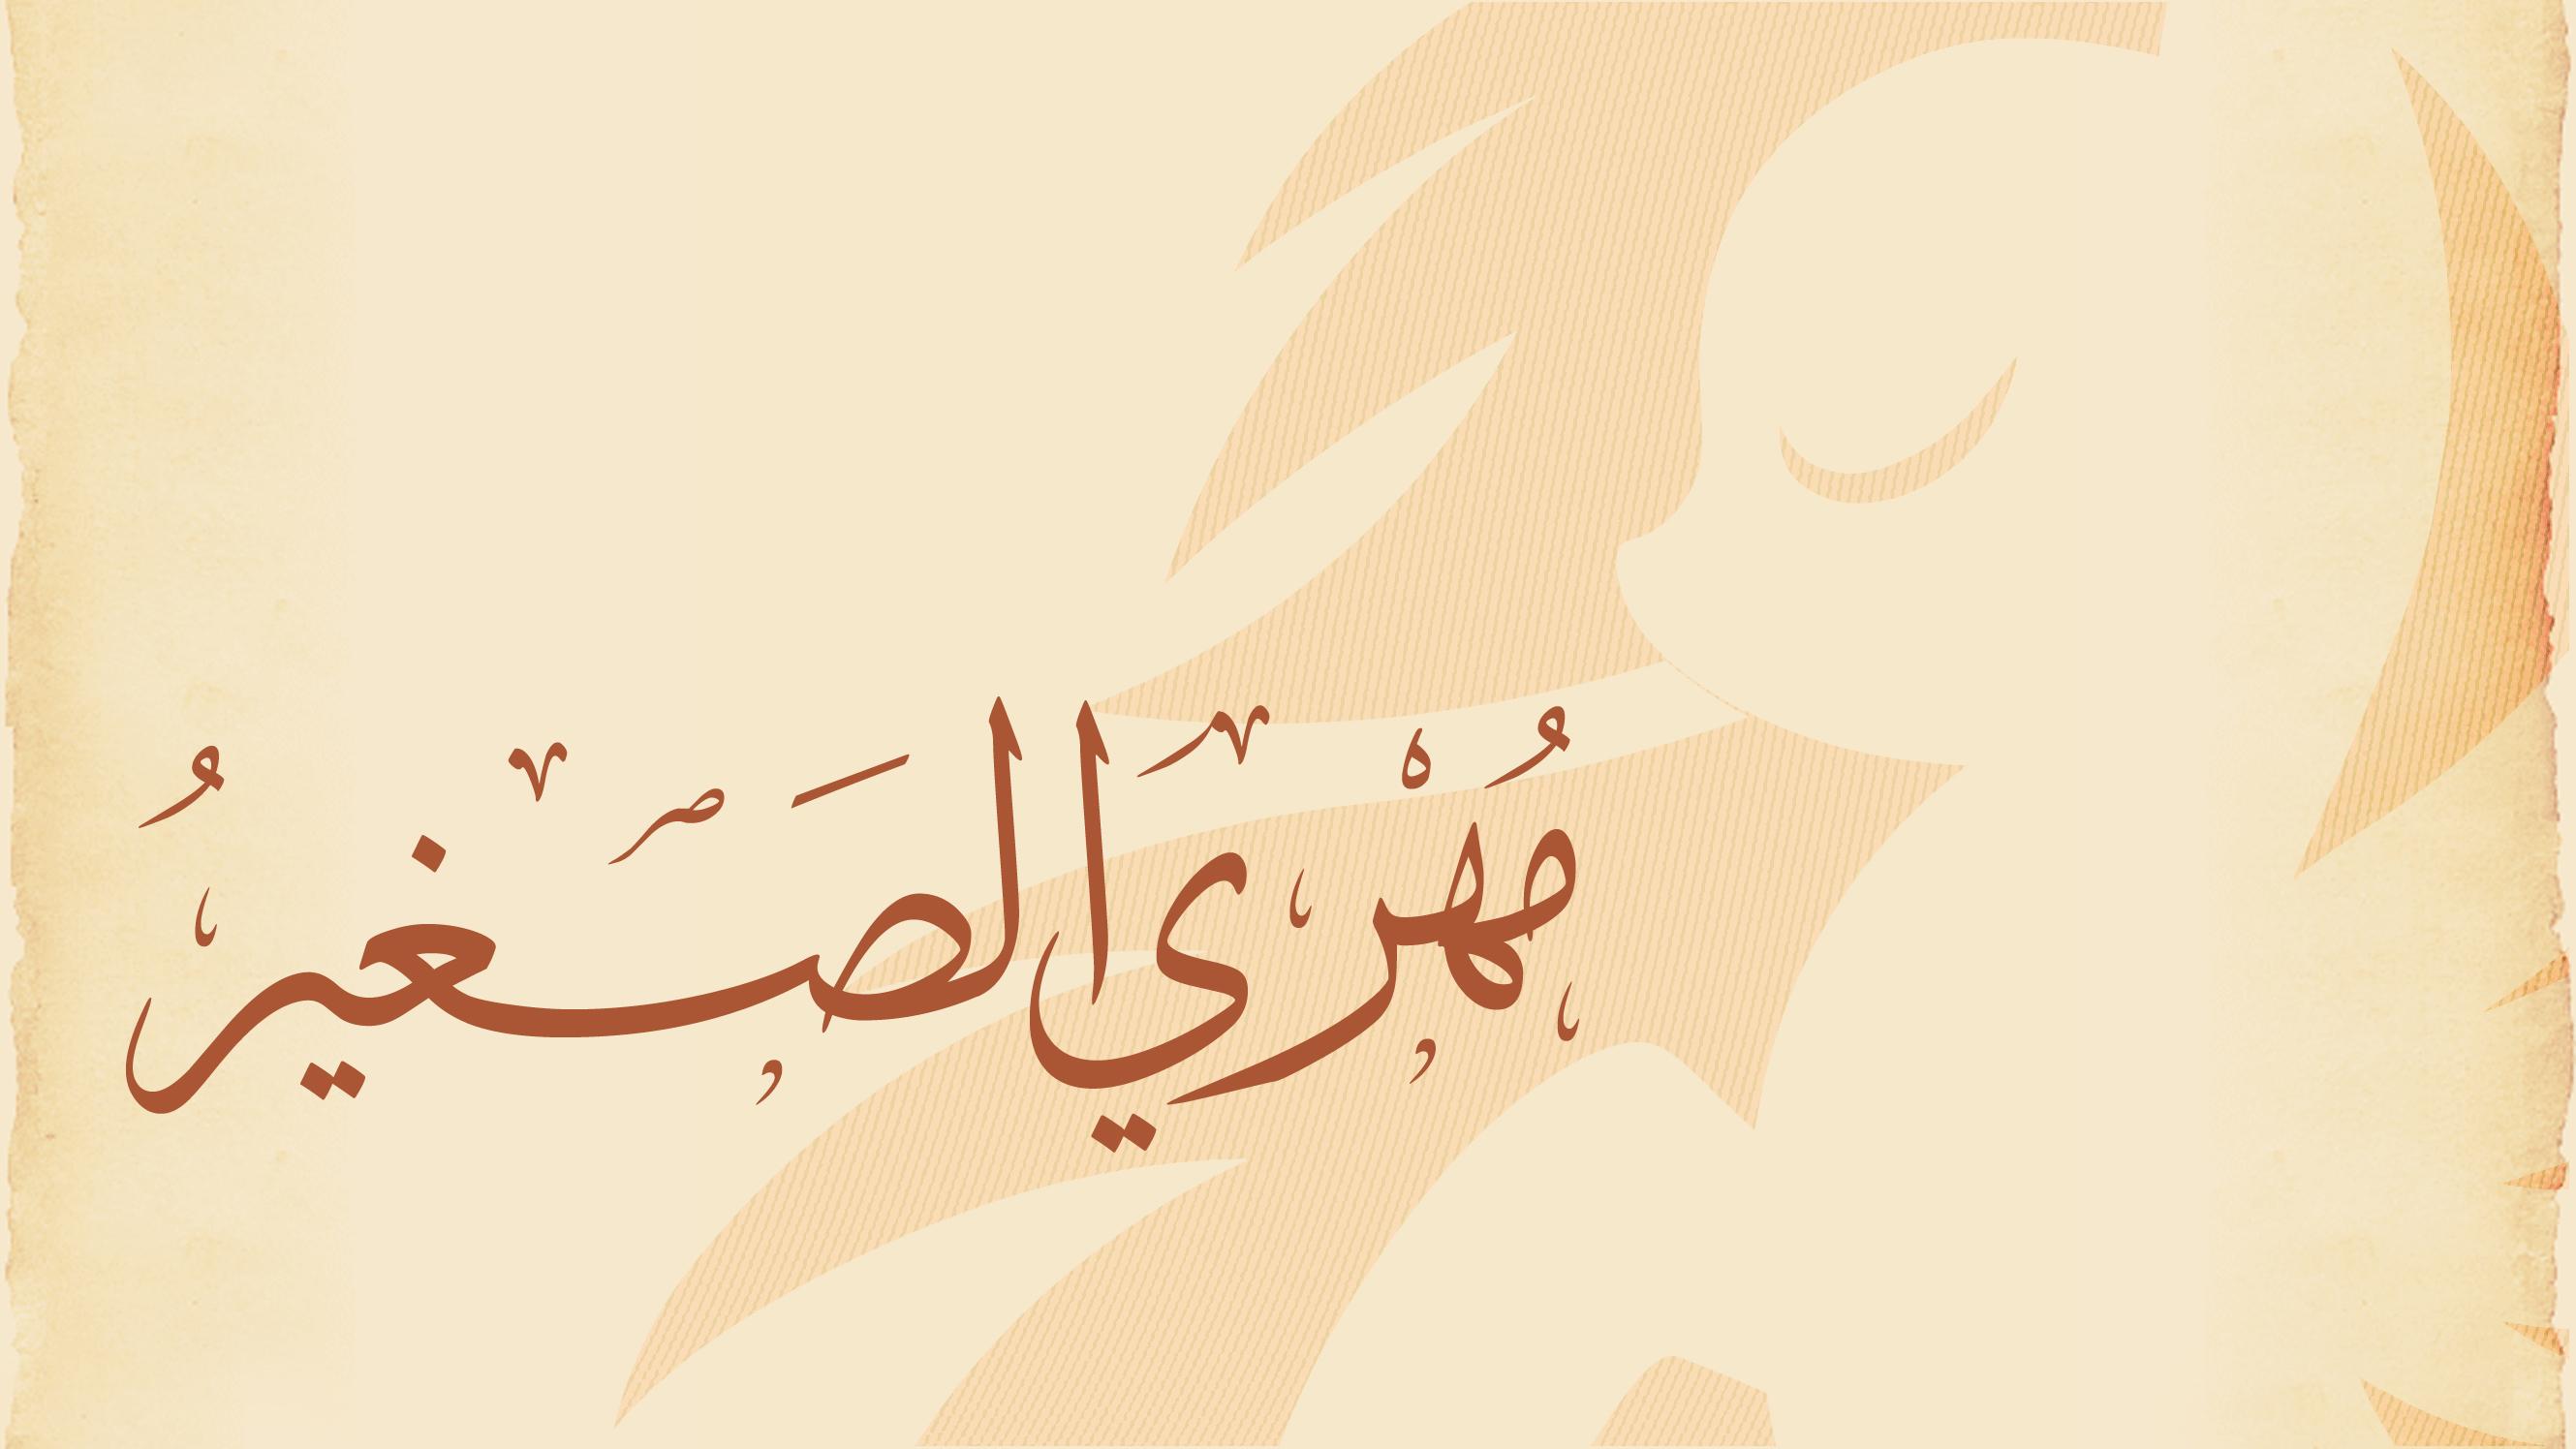 945290__safe_rainbow+dash_arabic_calligr